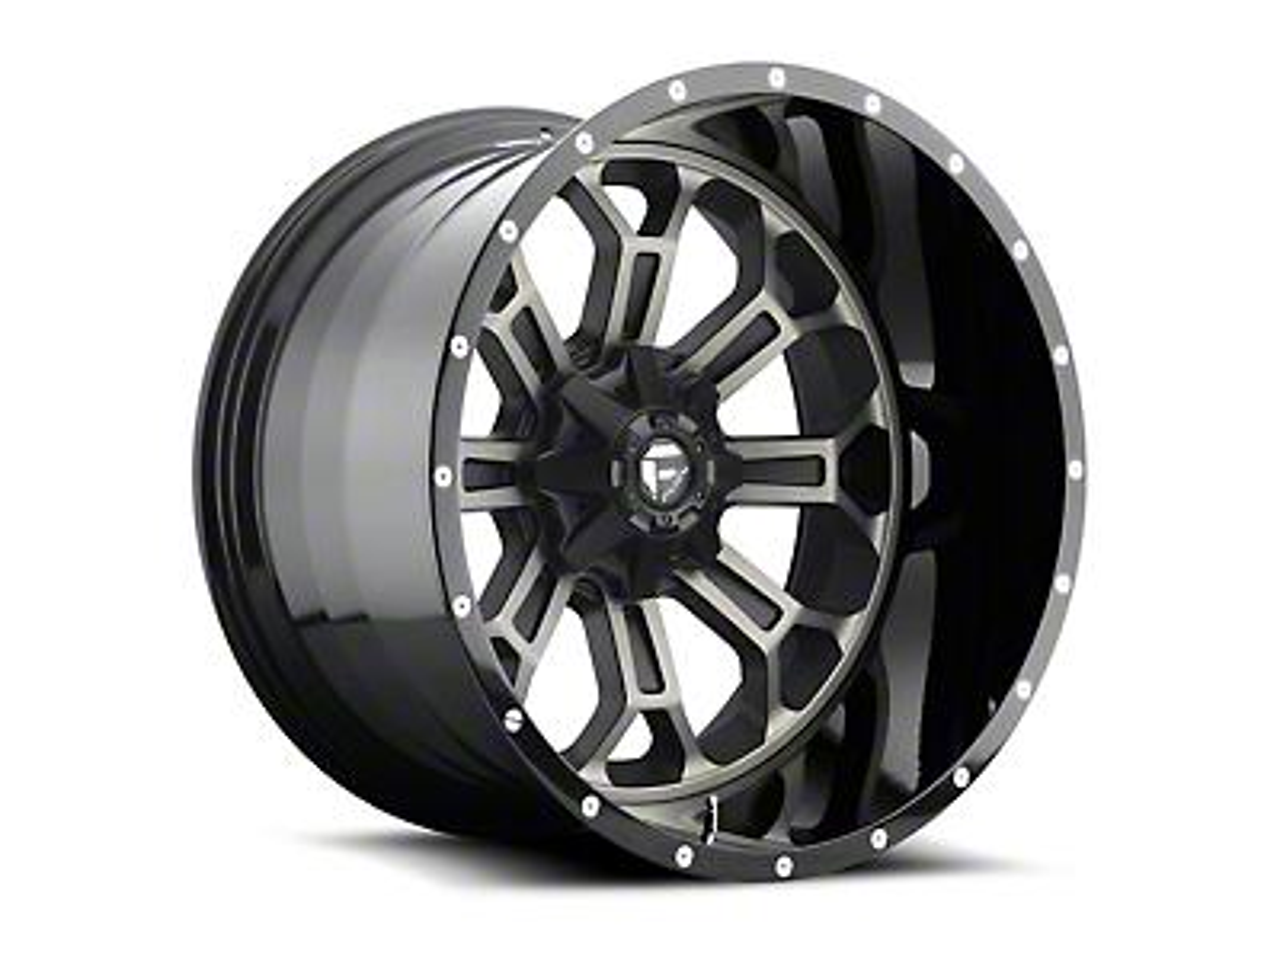 Fuel Wheels Crush Matte Black Machined 5-Lug Wheel - 20x12 (02-18 RAM 1500, Excluding Mega Cab)